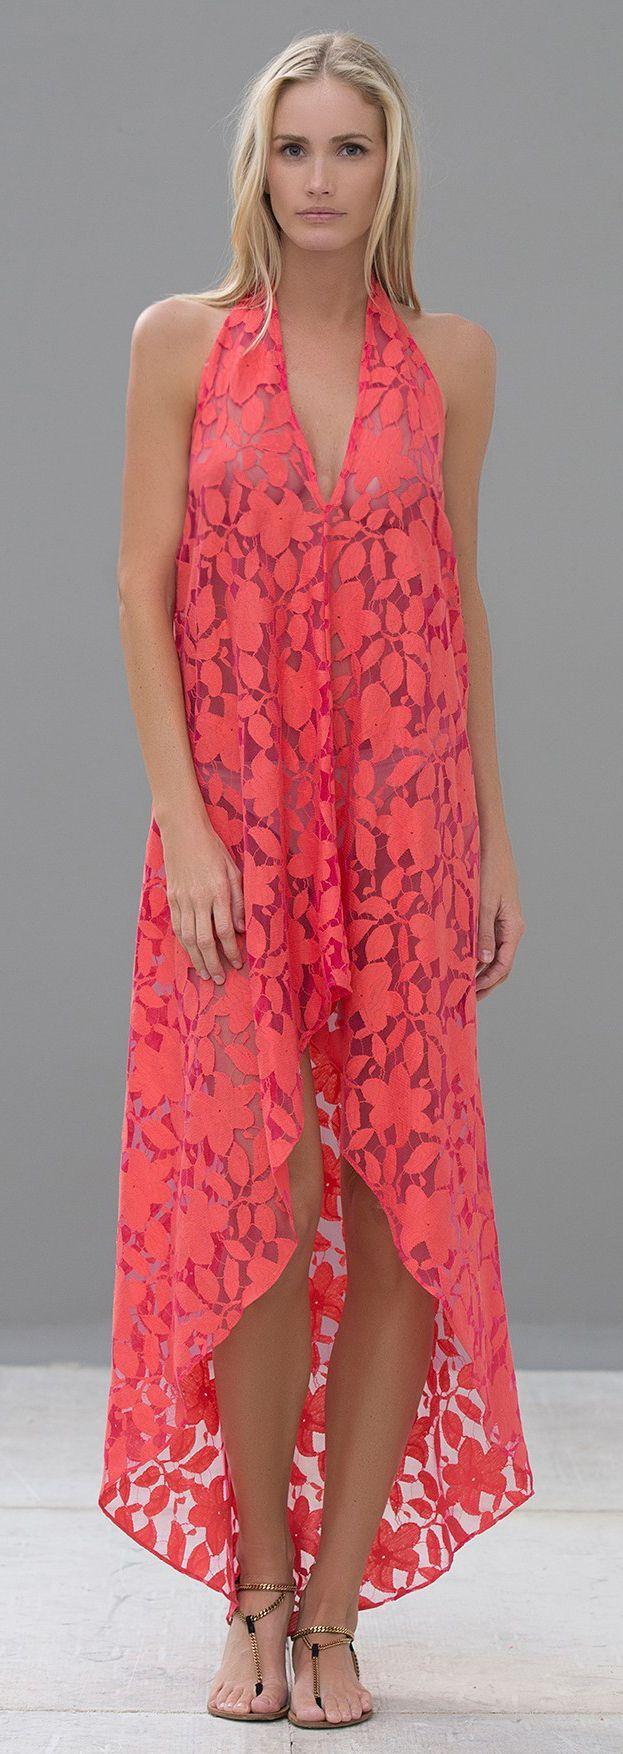 Stylish Women S Fashion Coral Maddox Halter Coverup Stylish Women Fashion Fashion Dresses [ 1754 x 623 Pixel ]